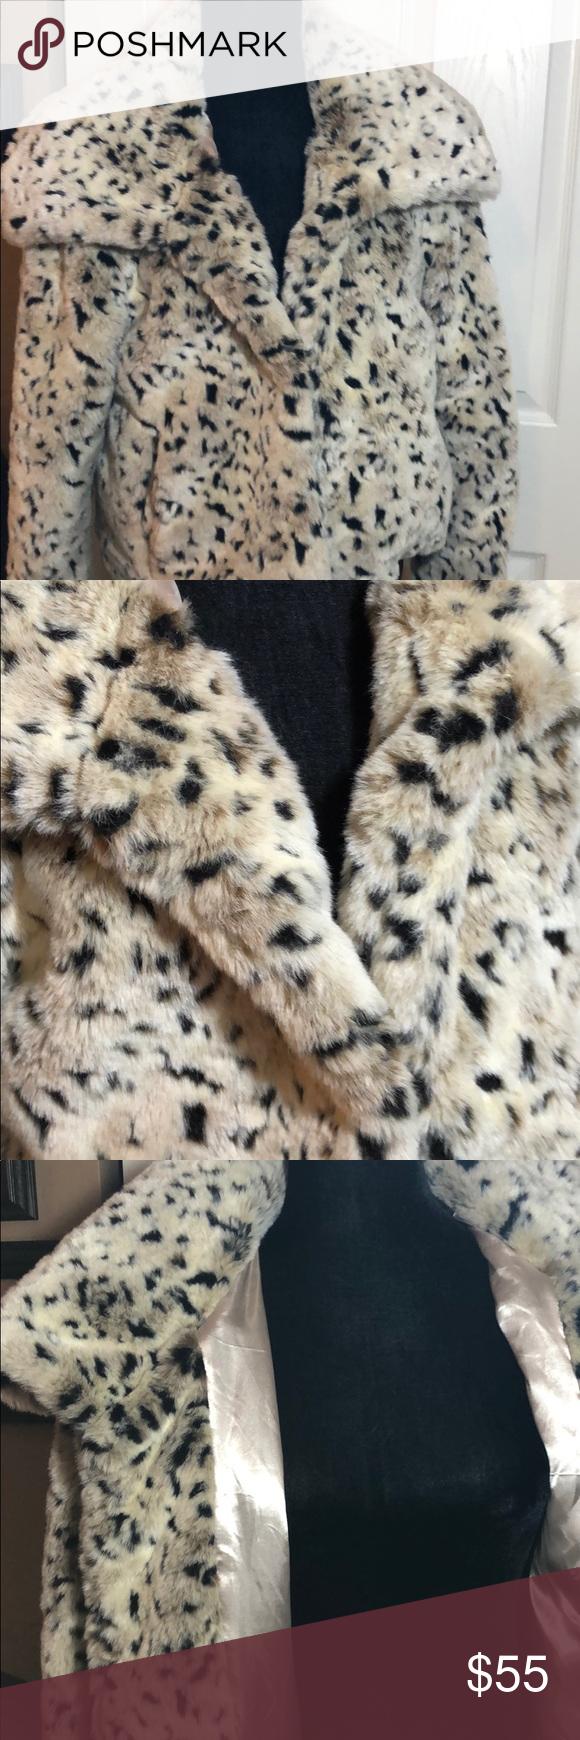 Covington Outerwear Jacket Animal Print Faux Fur Jacket Has Pockets In Front Really Cute Covington Jackets Coats Outerwear Jackets Jackets Faux Fur Jacket [ 1740 x 580 Pixel ]